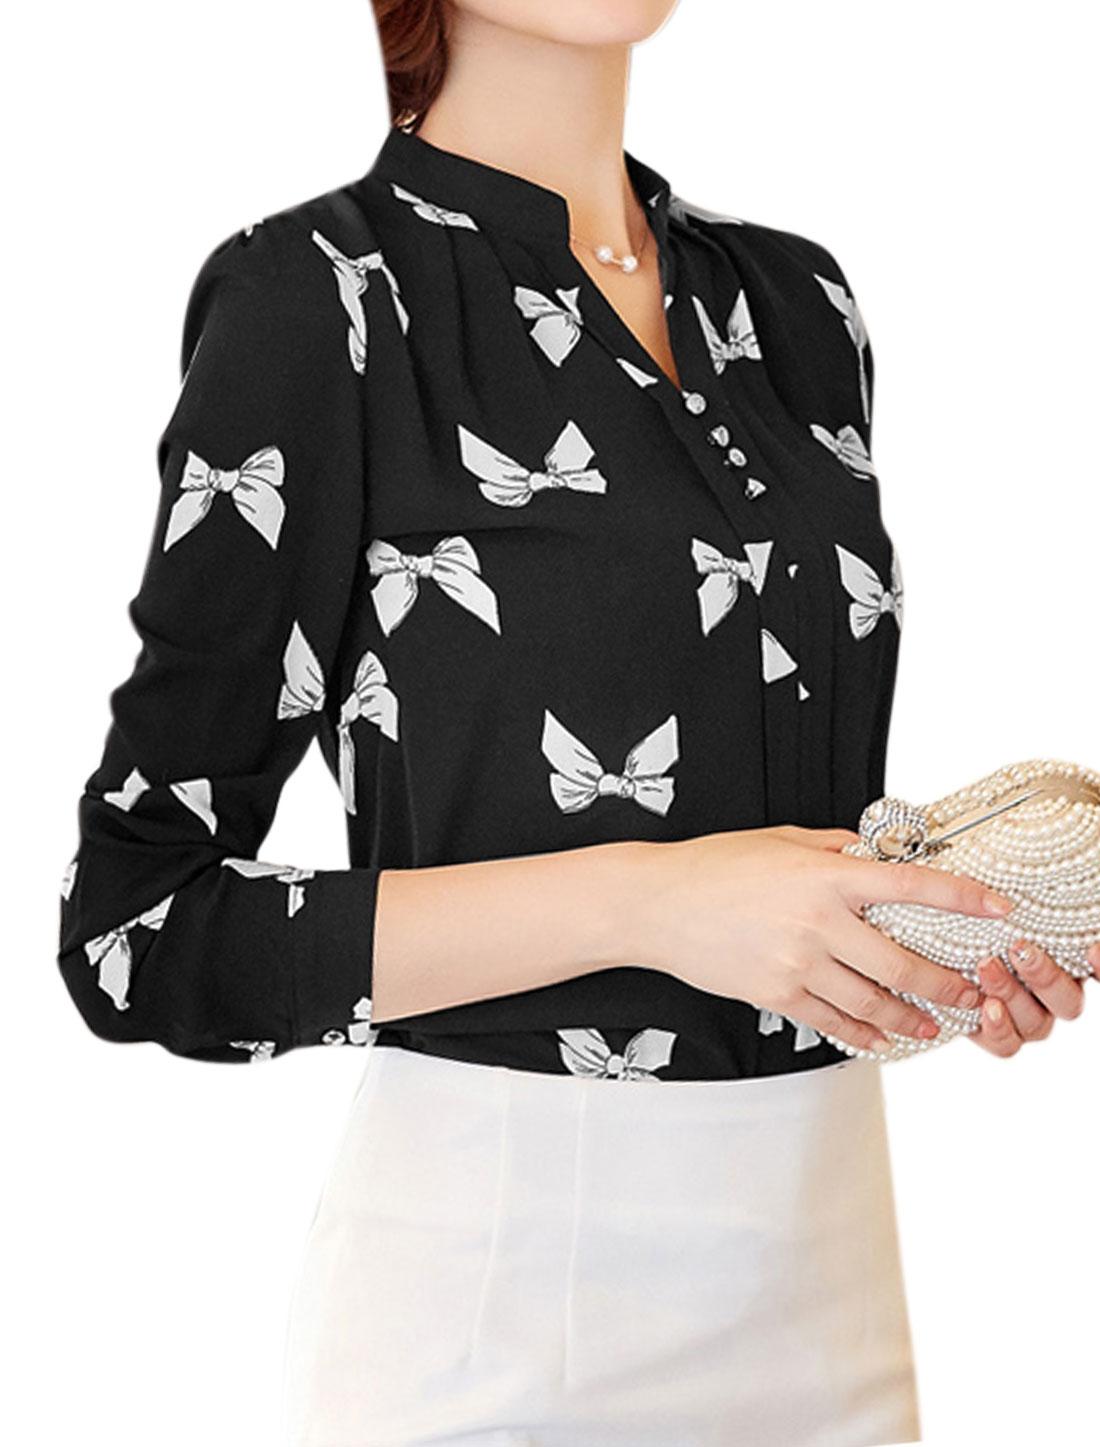 Women Stand Collar Button Decor Bow Tie Print Blouse Black M